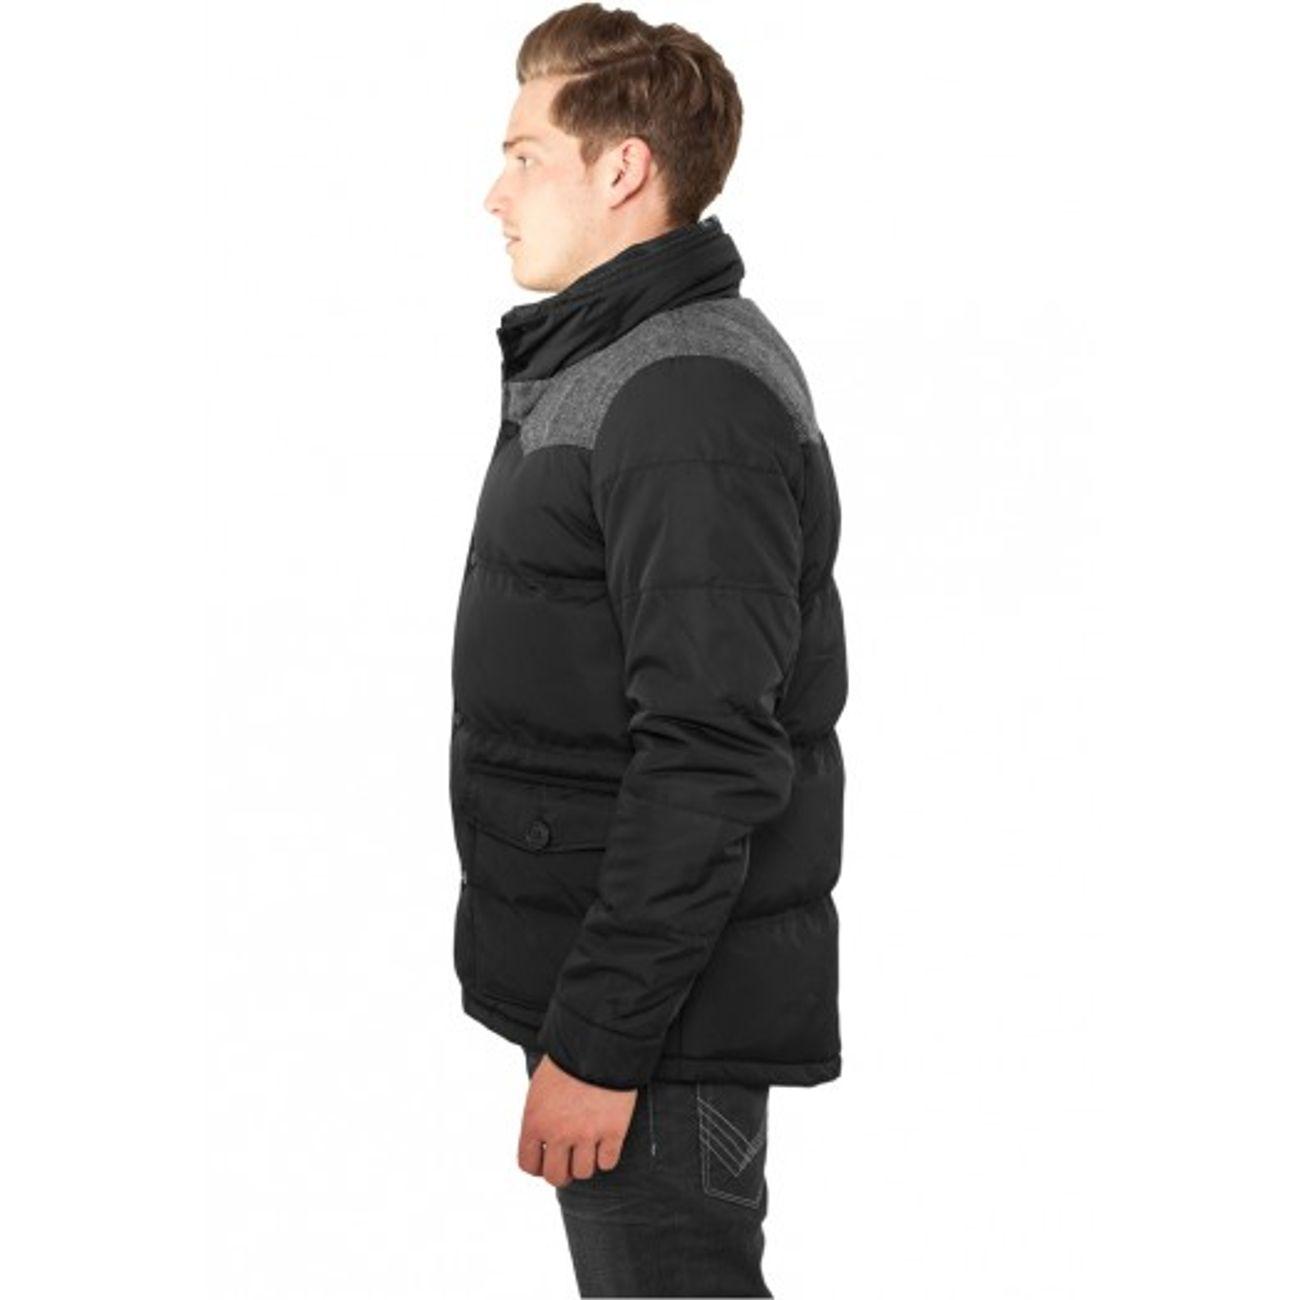 ... Mode- Lifestyle adulte URBAN CLASSICS Veste d hiver URBAN CLASSICS  Nylon Oxford Noir ... a87a6498634b